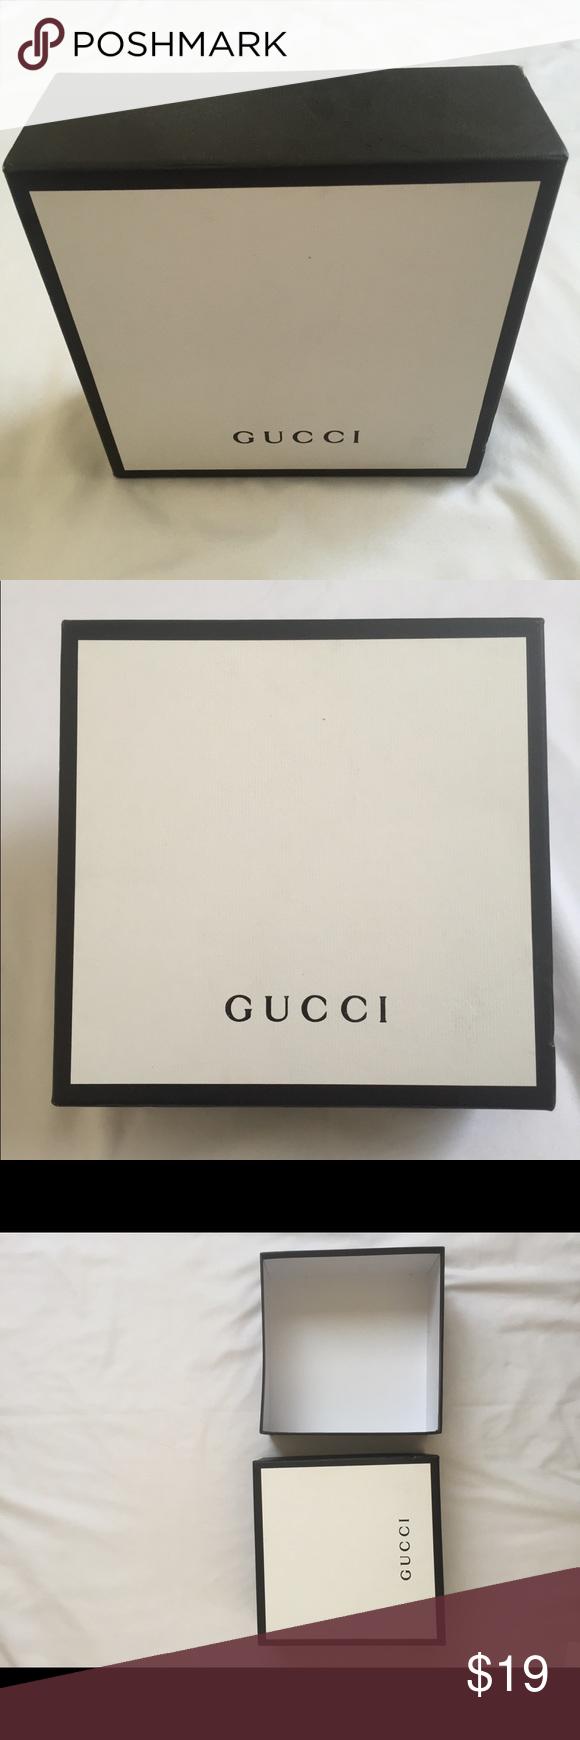 187b540a26c Gucci Empty Belt Box with Bag Good Condition. Gucci Belt Bag and Gucci Belt  Box